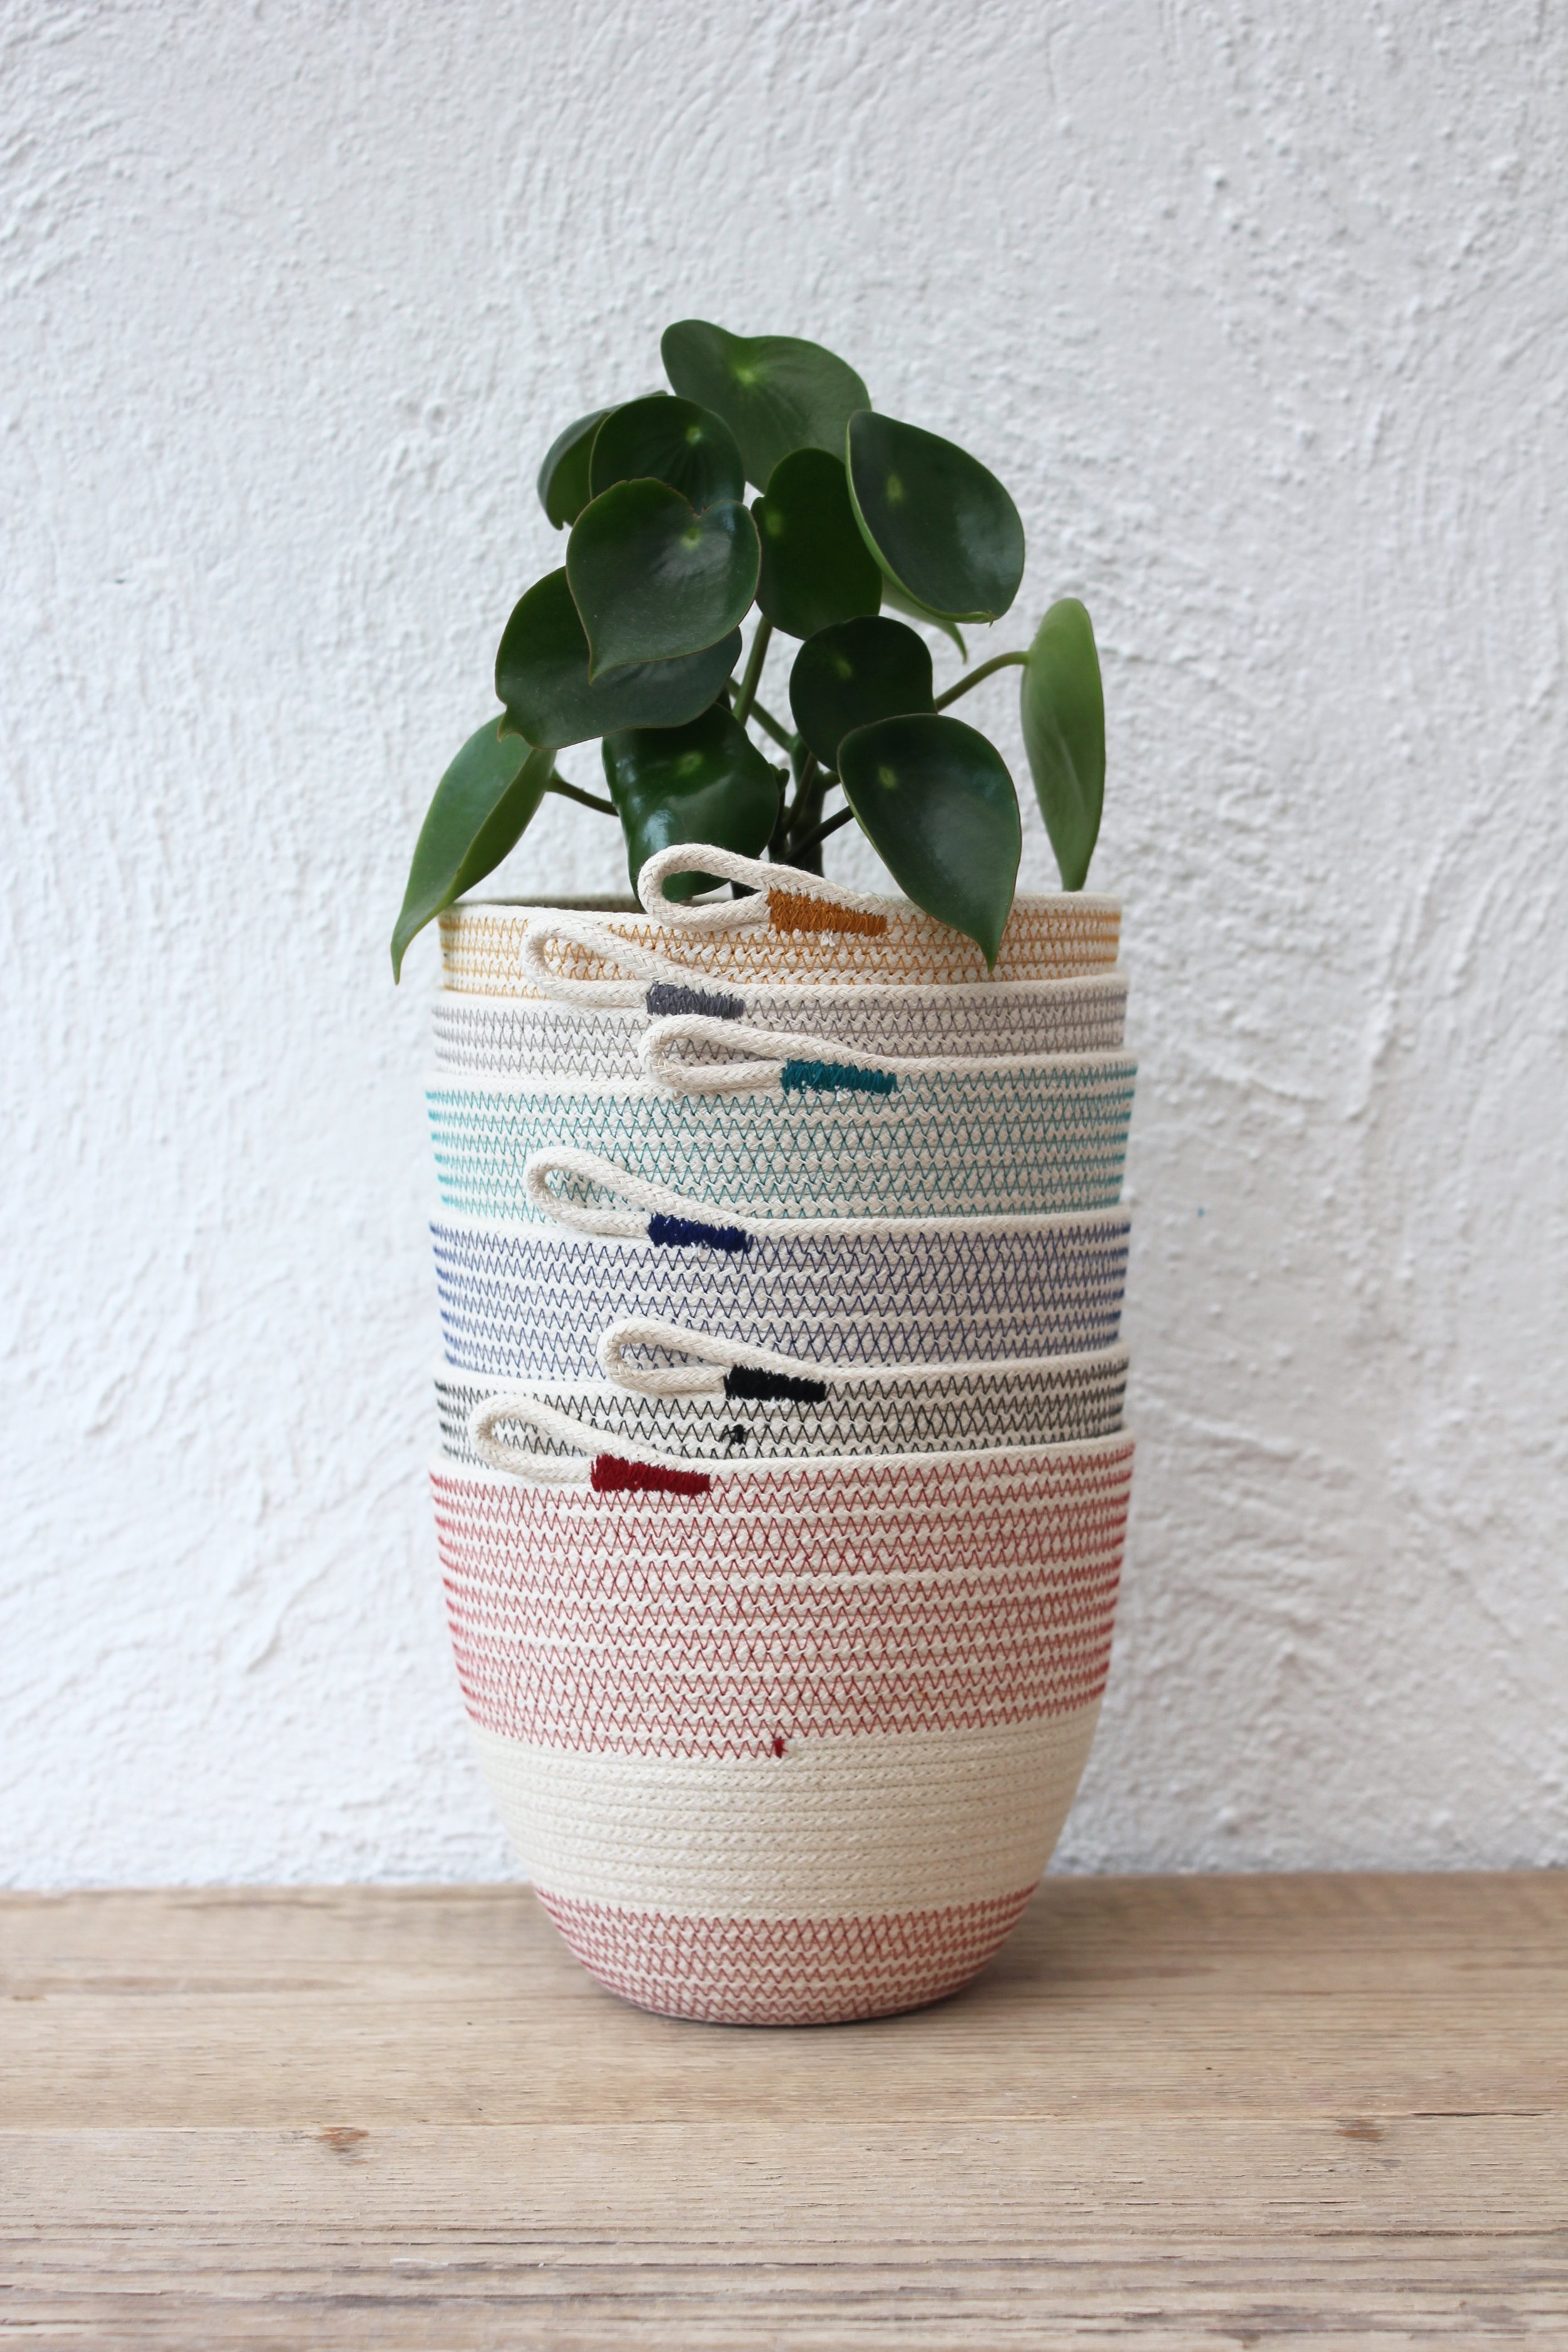 Striped planters A/W 2018